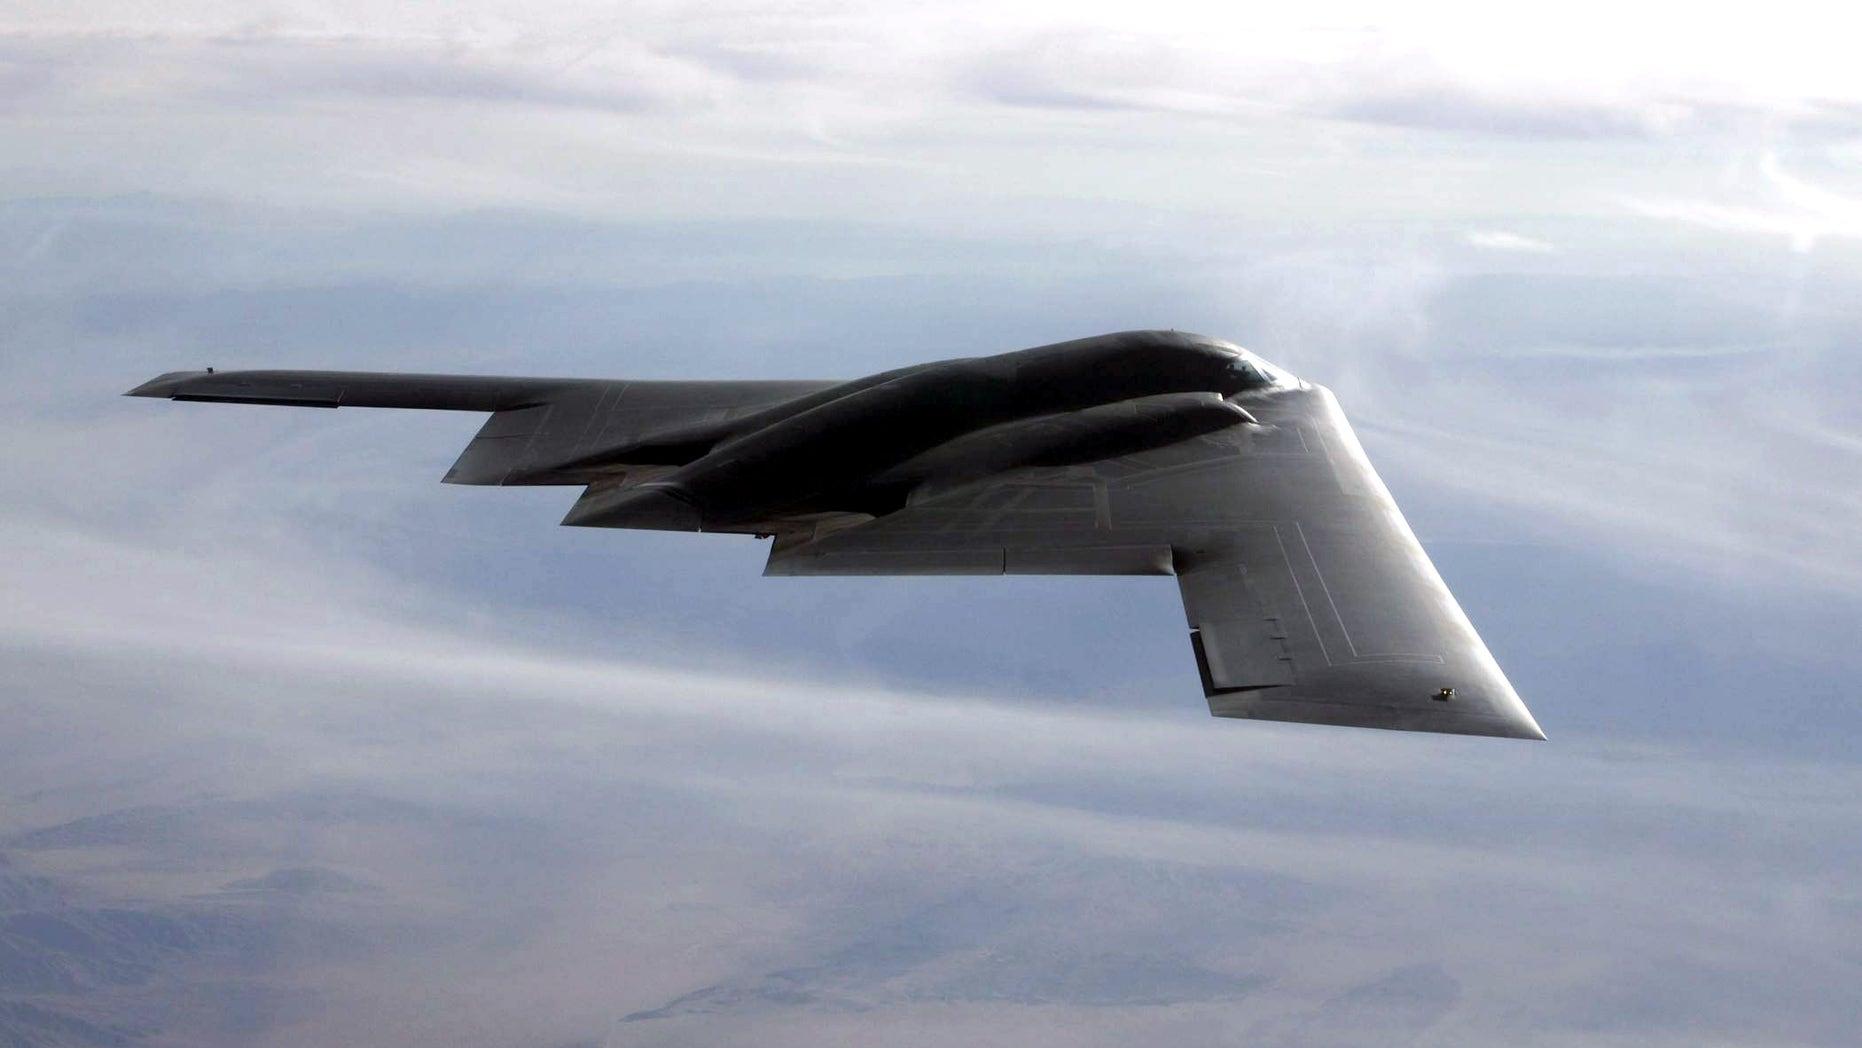 Westlake Legal Group CREDIT-USAF-B-2-BOMBER B-2 pilot recounts what it's like 'flying a stealth bomber' Warrior Maven Kris Osborn fox-news/tech/topics/us-air-force fnc/tech fnc db107434-e763-57c8-afd8-499533fe4eb1 article